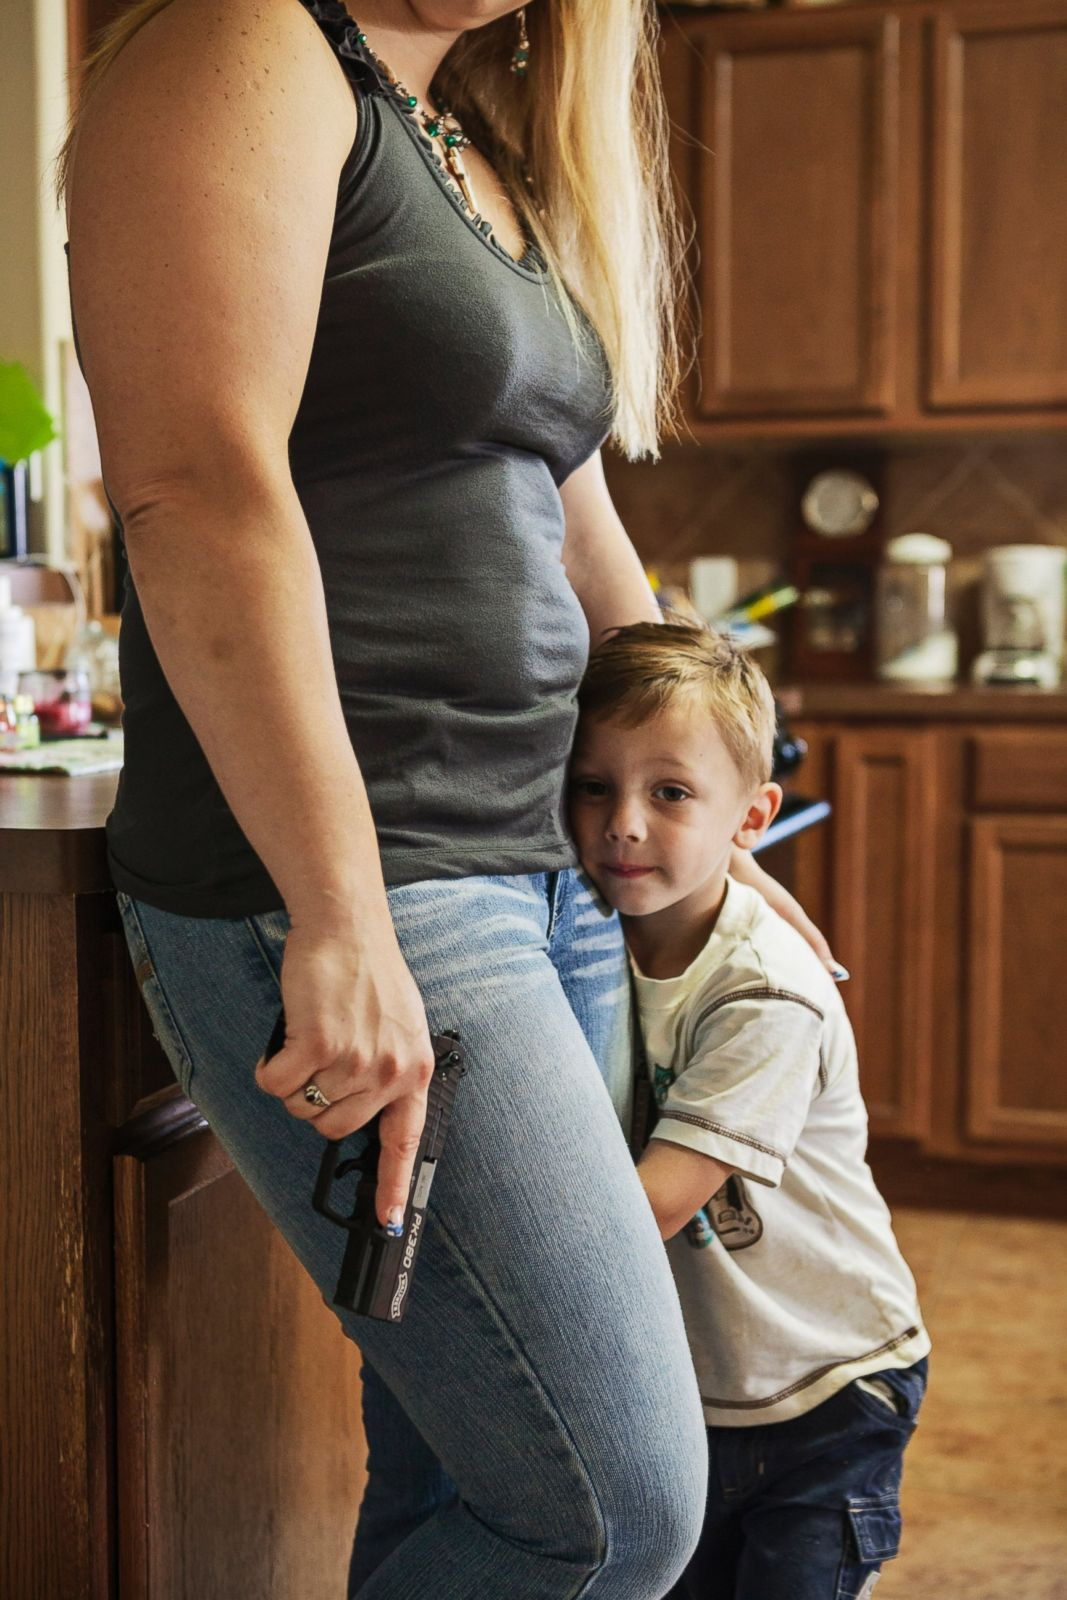 Texas Women Who Carry Guns Photos Image 4 Abc News